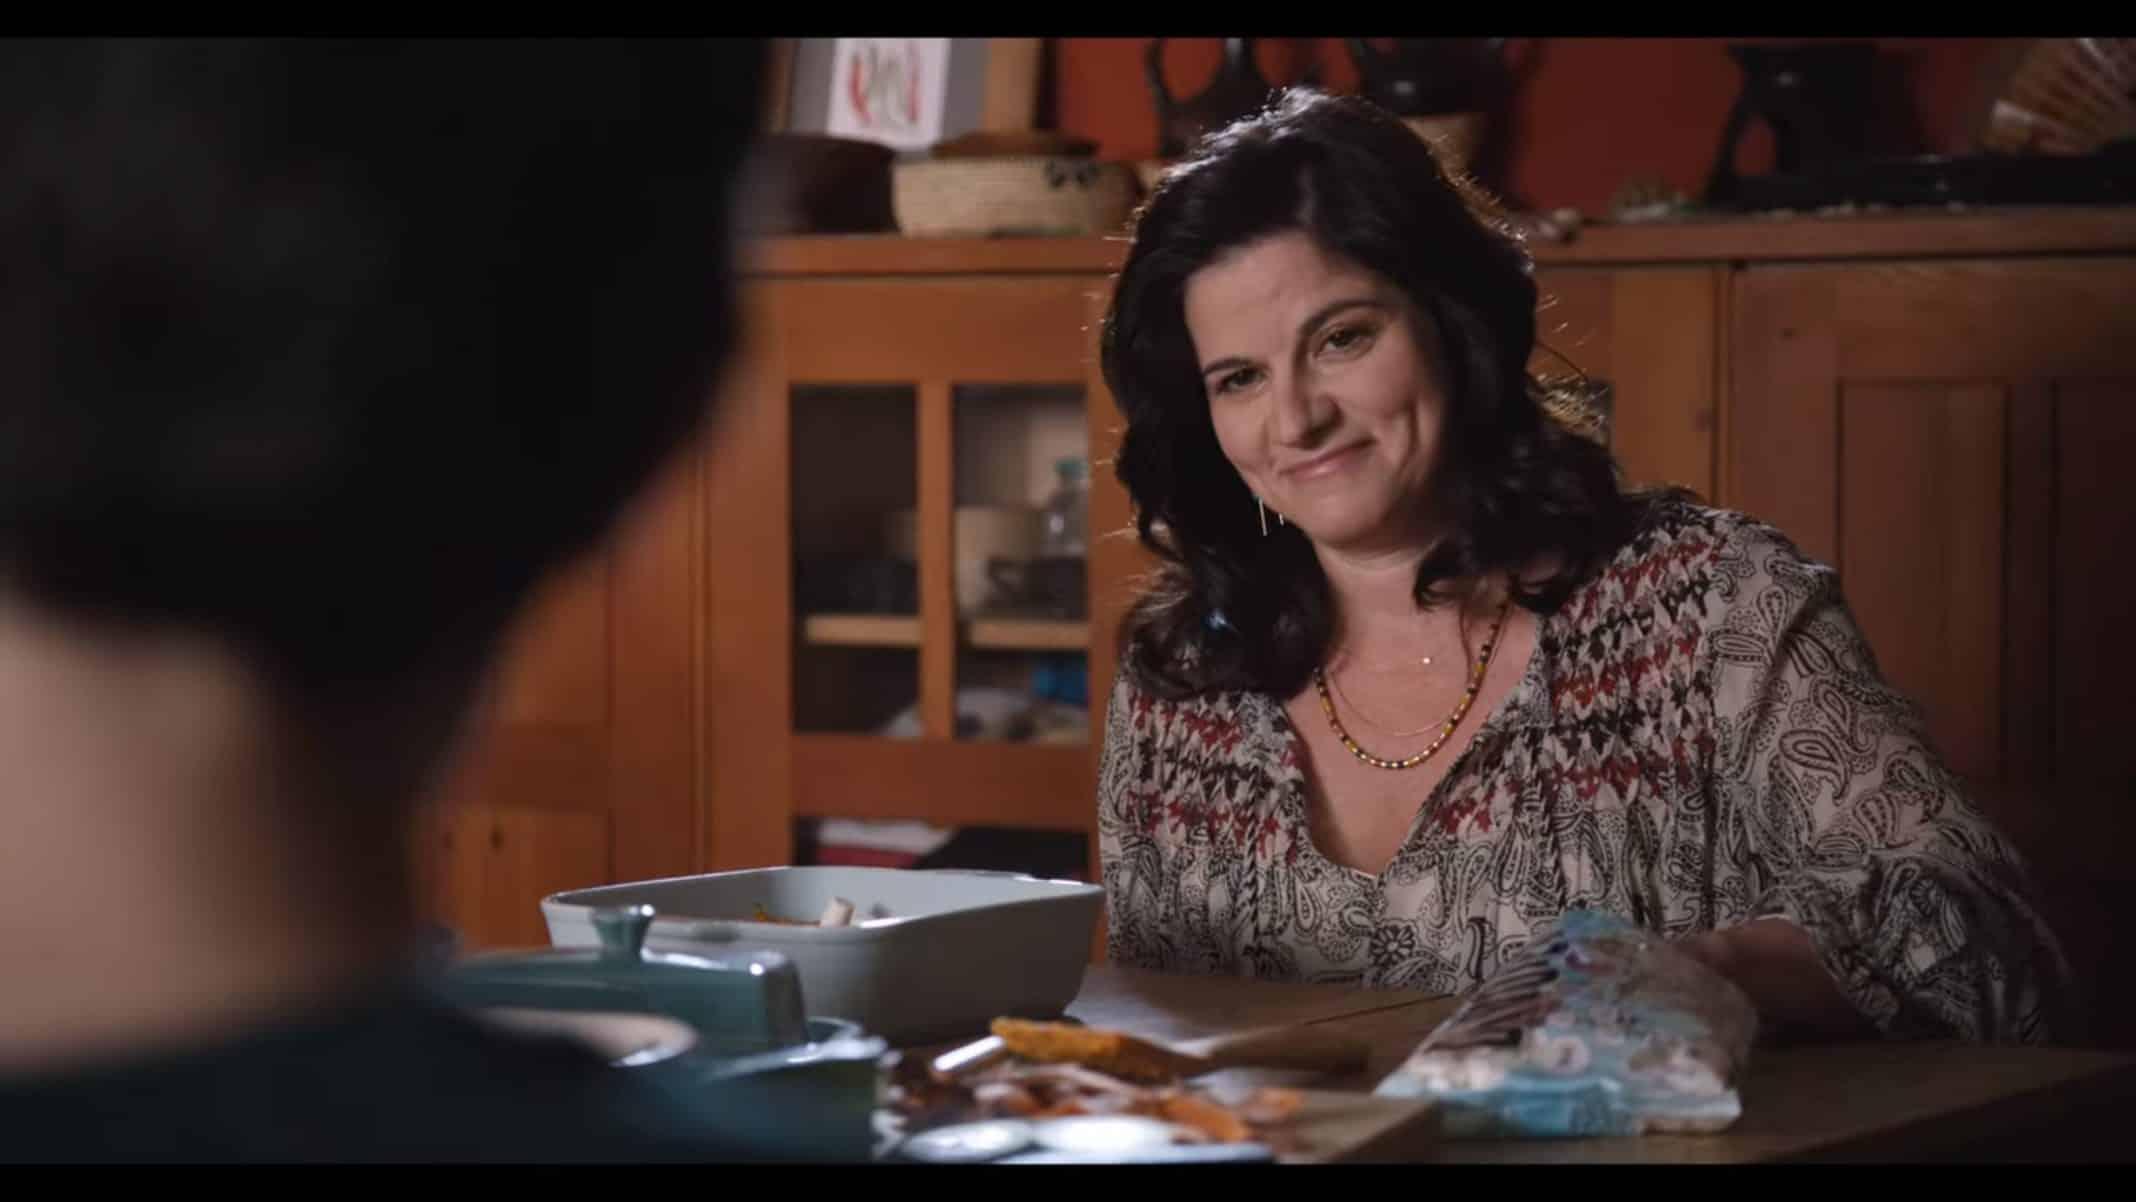 Mara (Lynn Adrianna) smiling at Elodie.